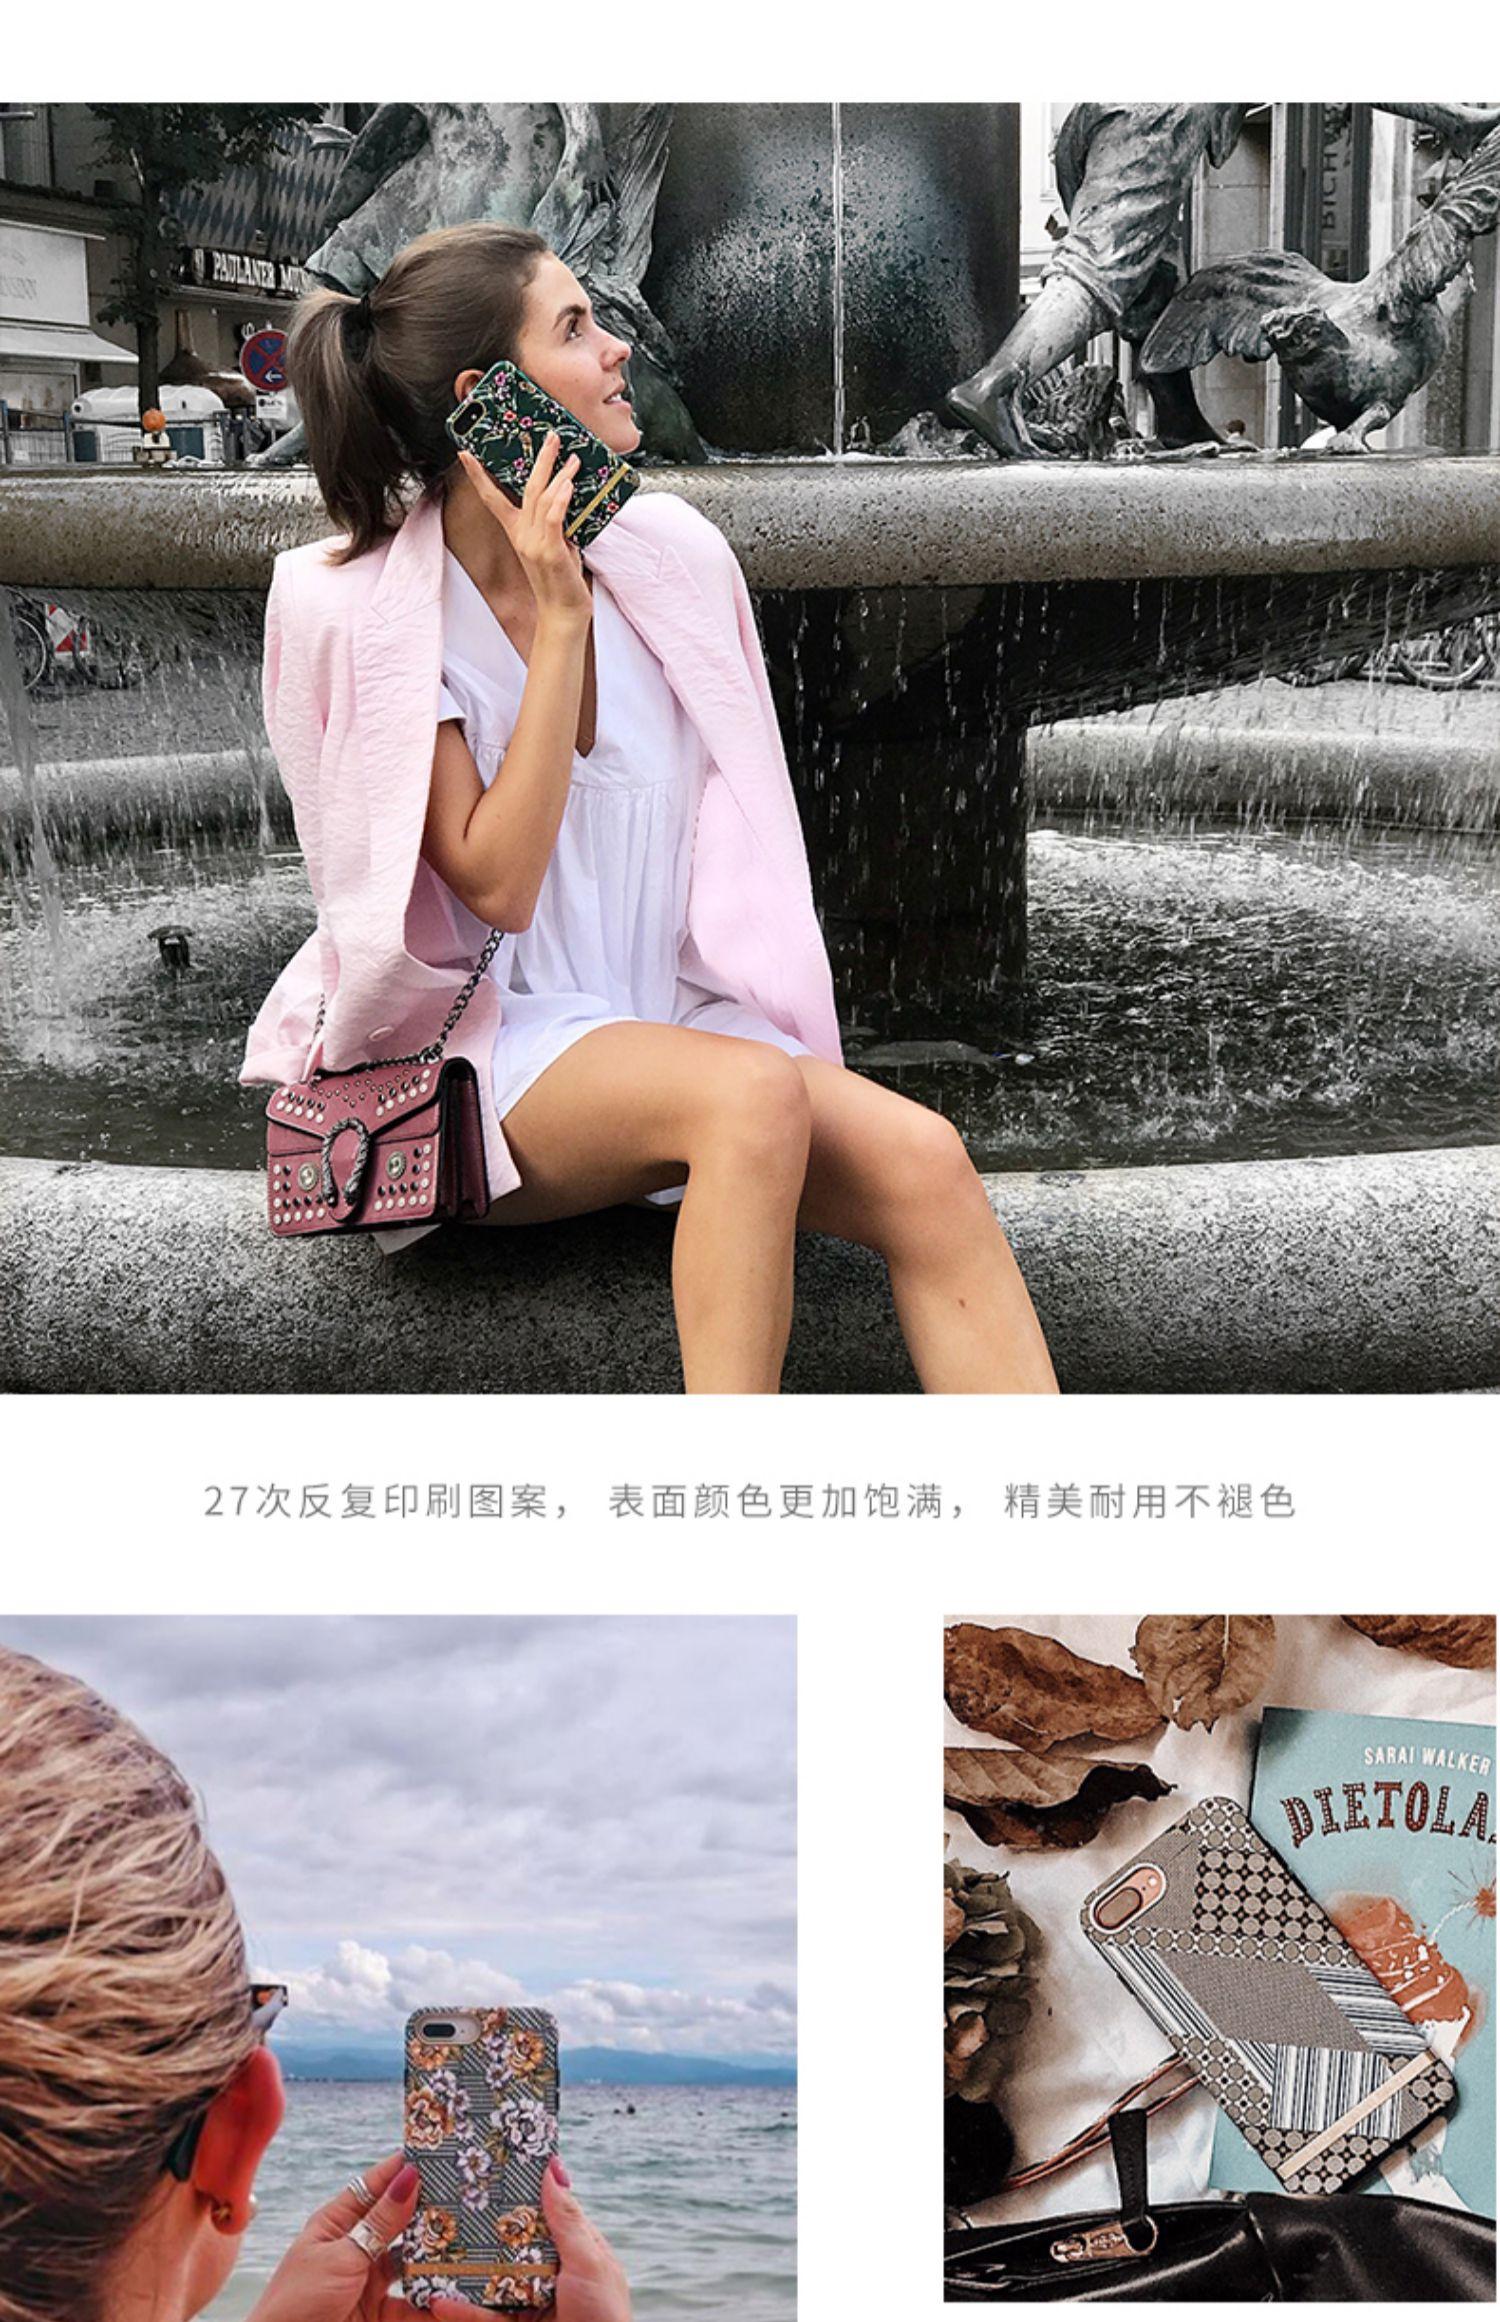 Richmond&Finch自由系列iPhoneXR瑞典轻奢网红双层防摔苹果手机壳商品详情图